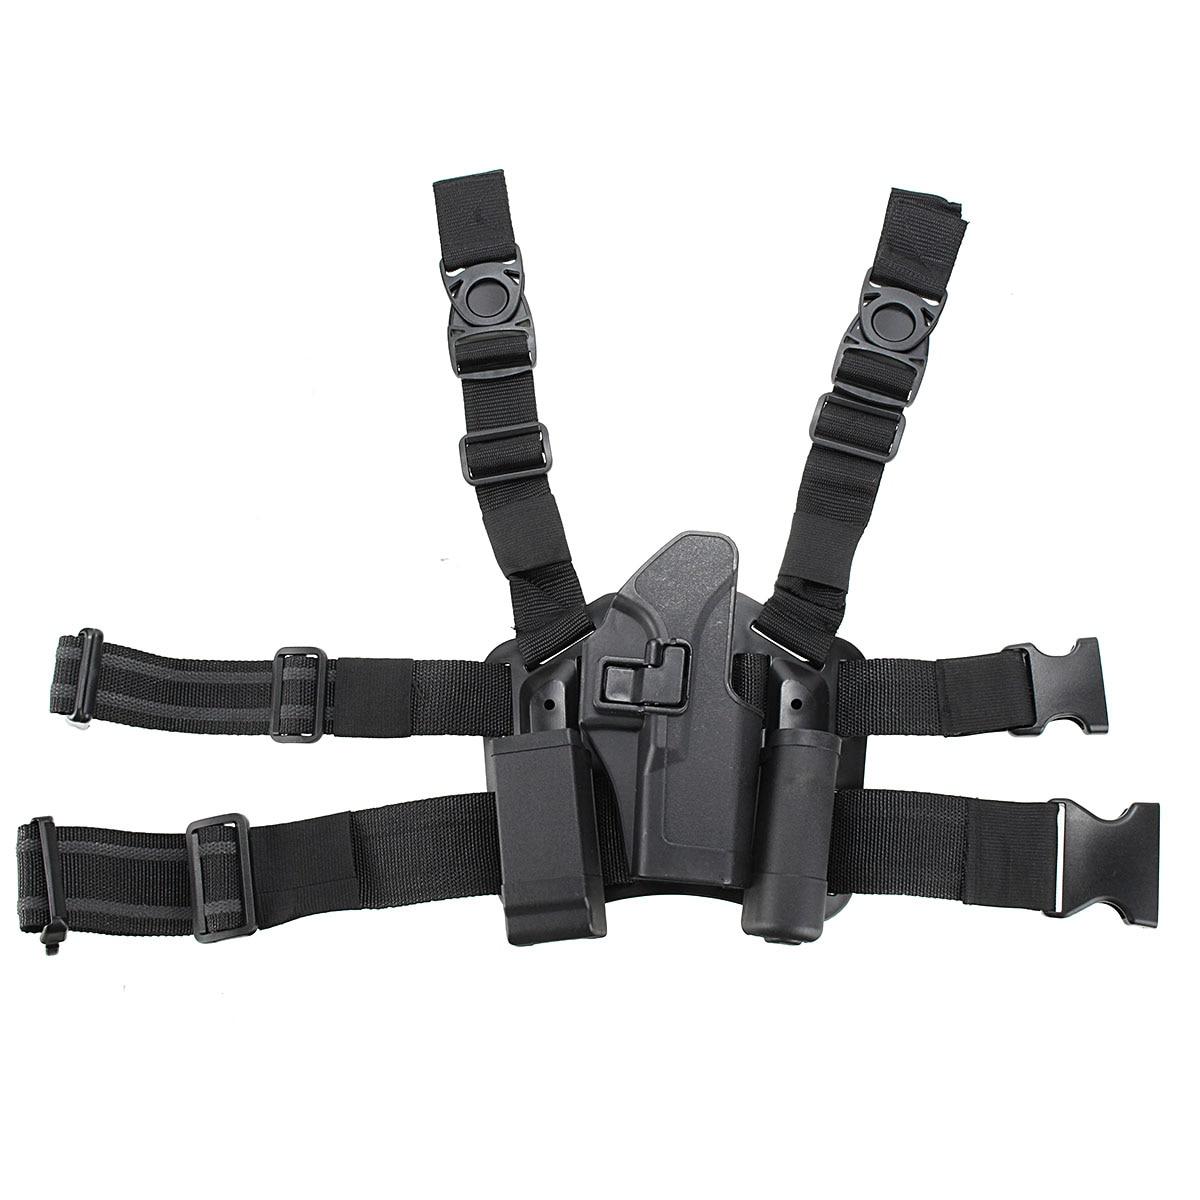 Tactical Right Leg Thigh Holster w/ Magazine Torch Pouch Glock 17 19 22 23 31 32 потолочная люстра st luce sl921 sl921 102 07